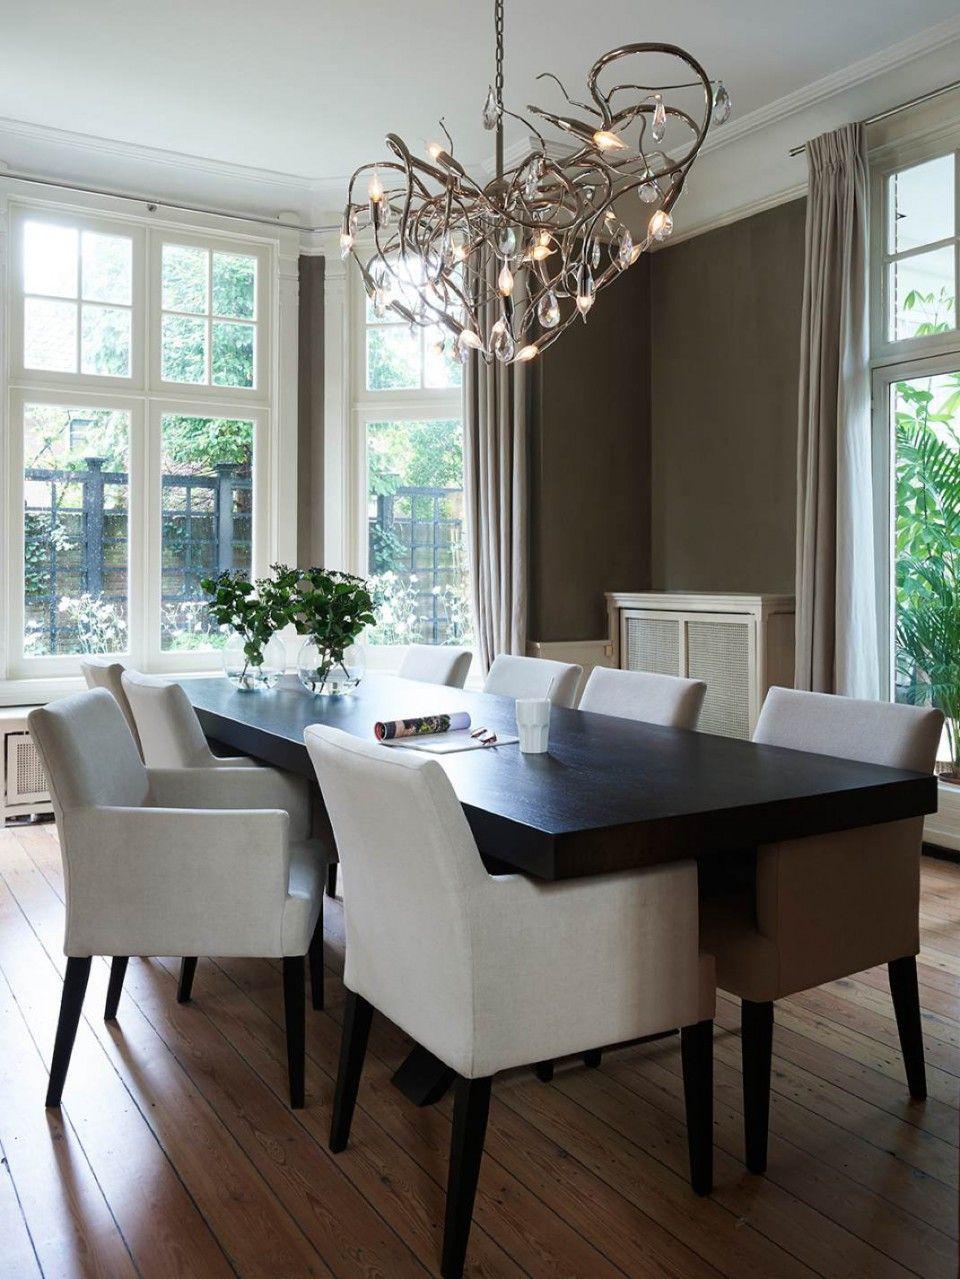 Designa Interieur & Architectuur - Verbouwing & Interieurontwerp villa Hilversum